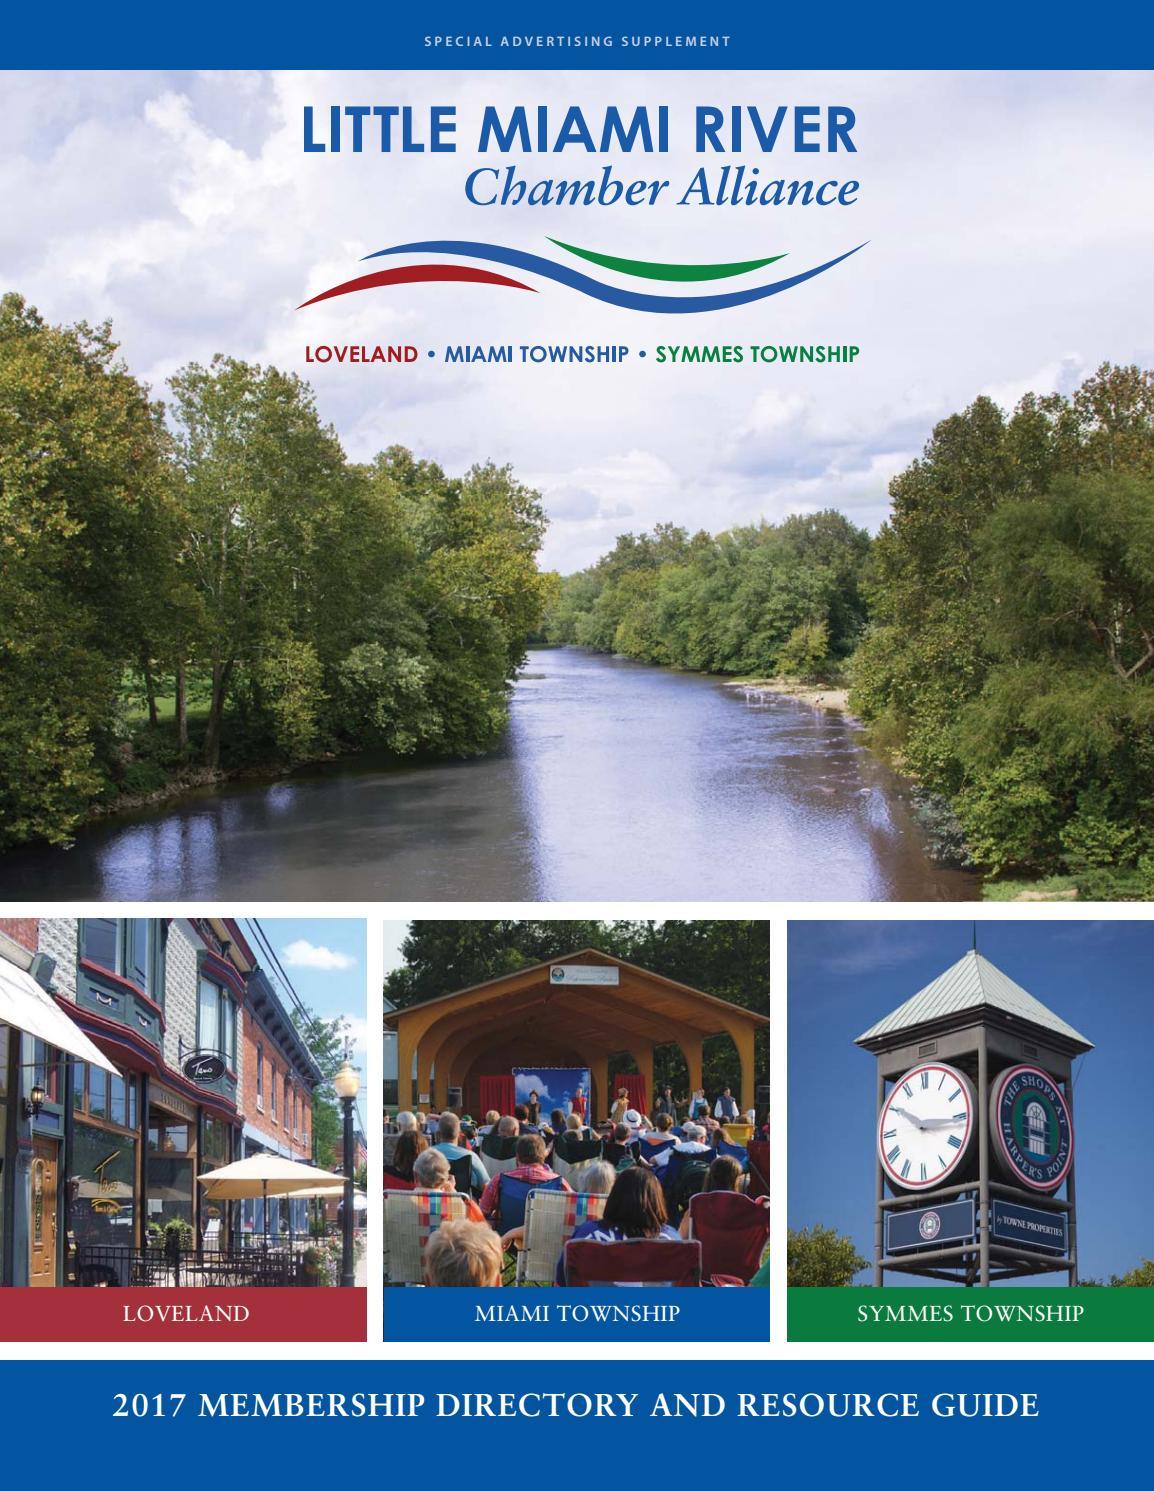 Little miami river chamber alliance 2017 membership directory resource guide by cincinnati magazine issuu